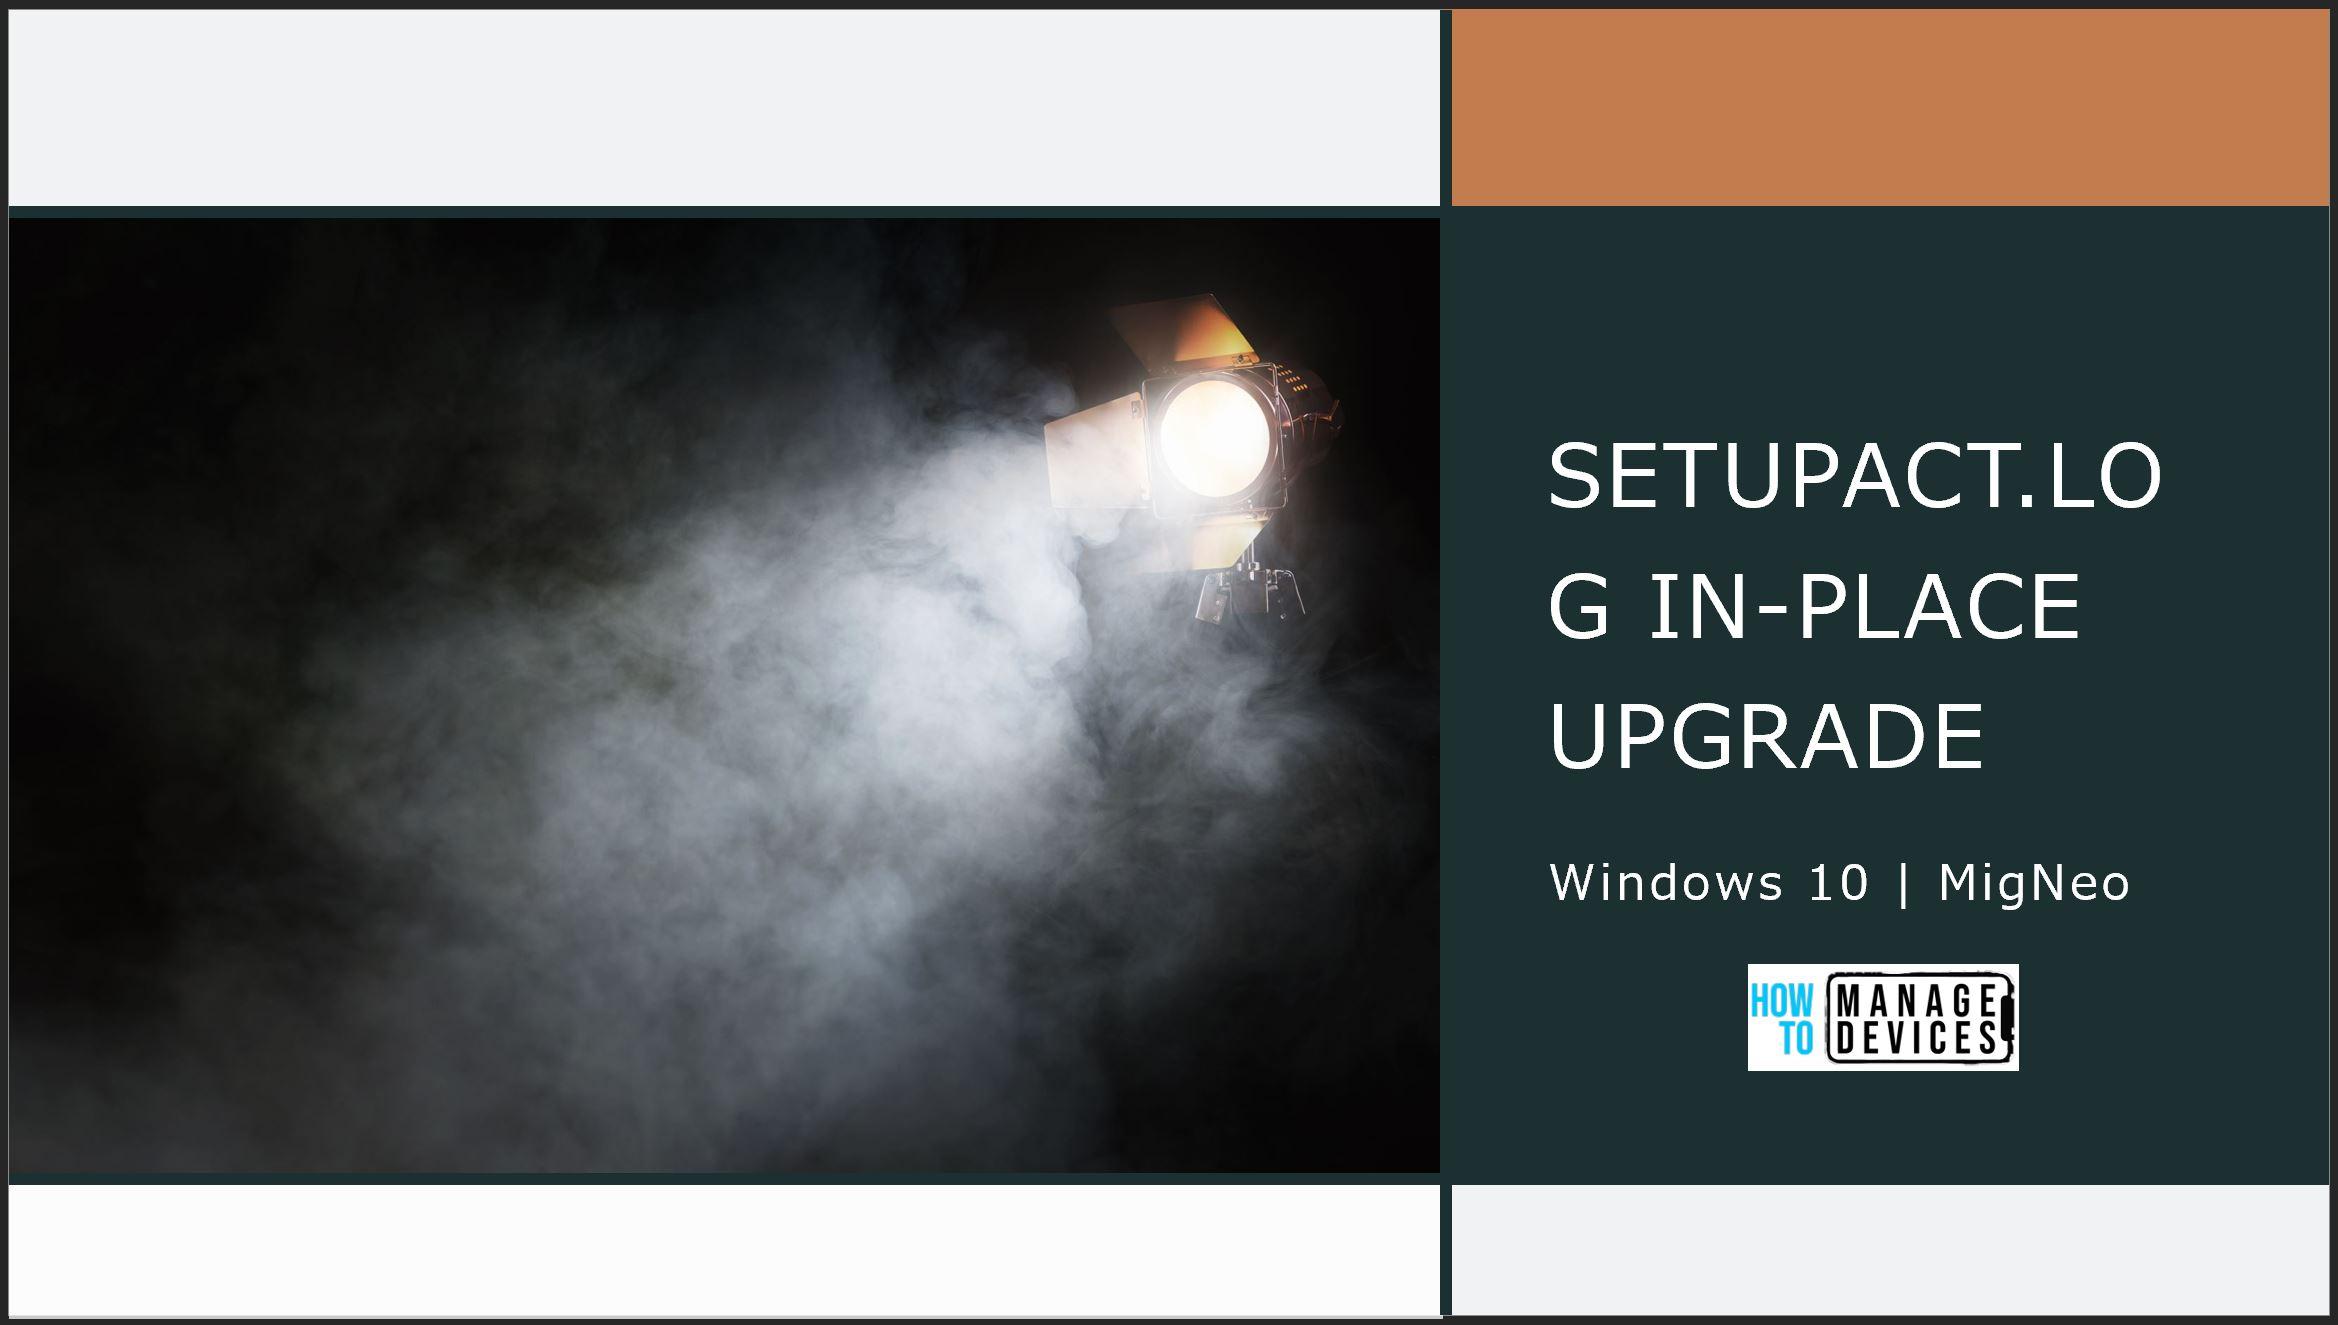 Windows 10 Upgrade SetupAct